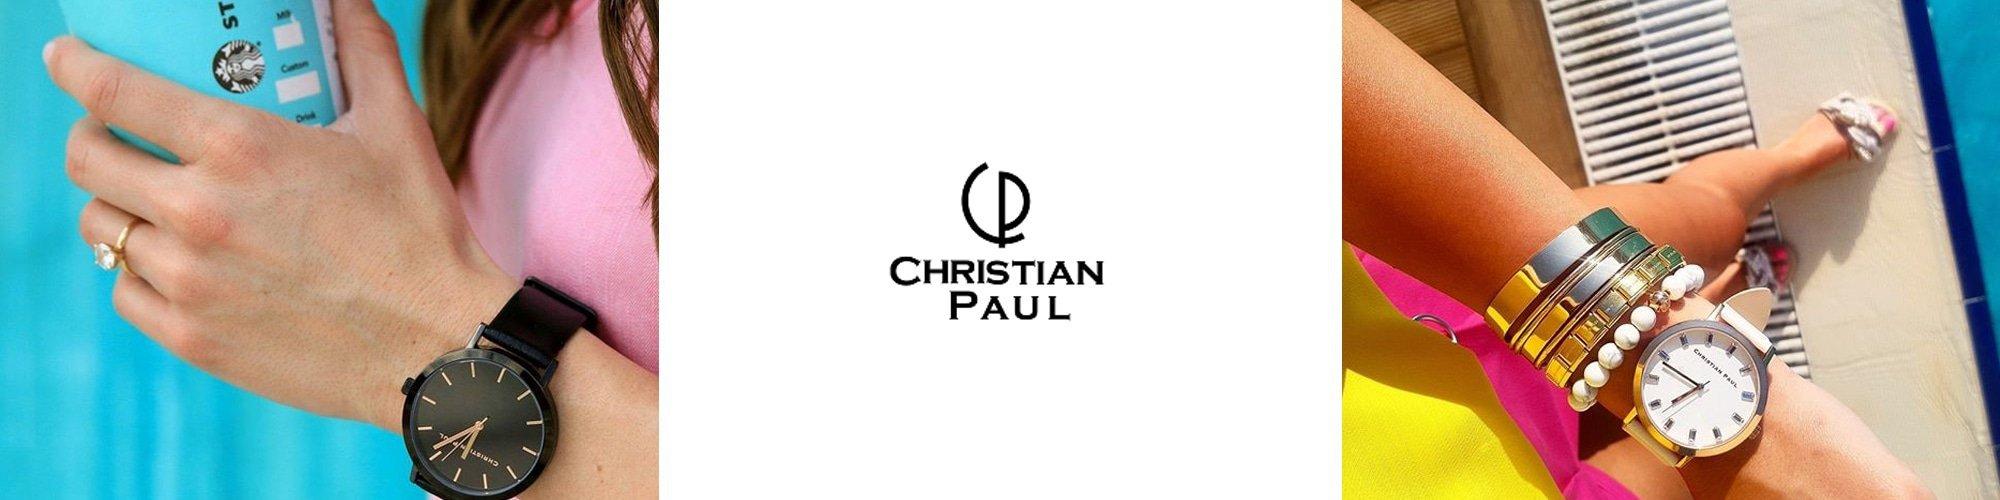 Christian Paul horloges